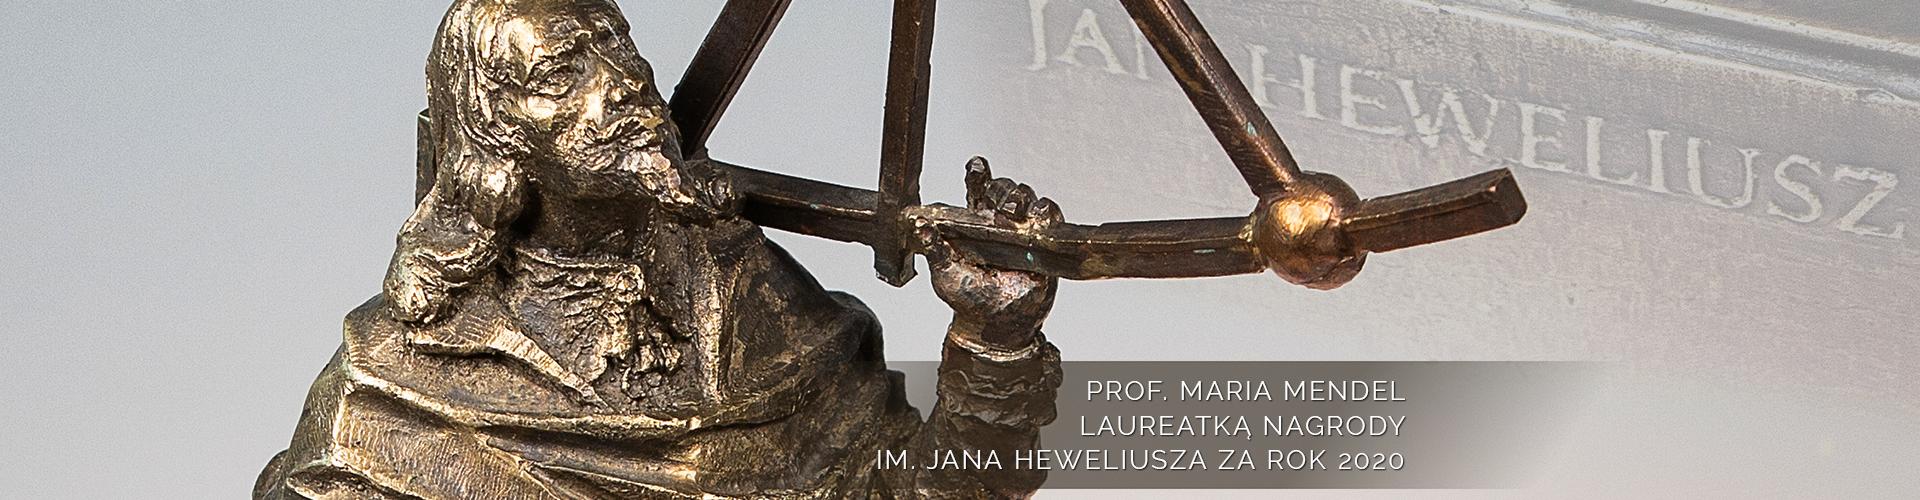 Profesor Maria Mendel laureatką Nagrody im. Jana Heweliusza za rok 2020